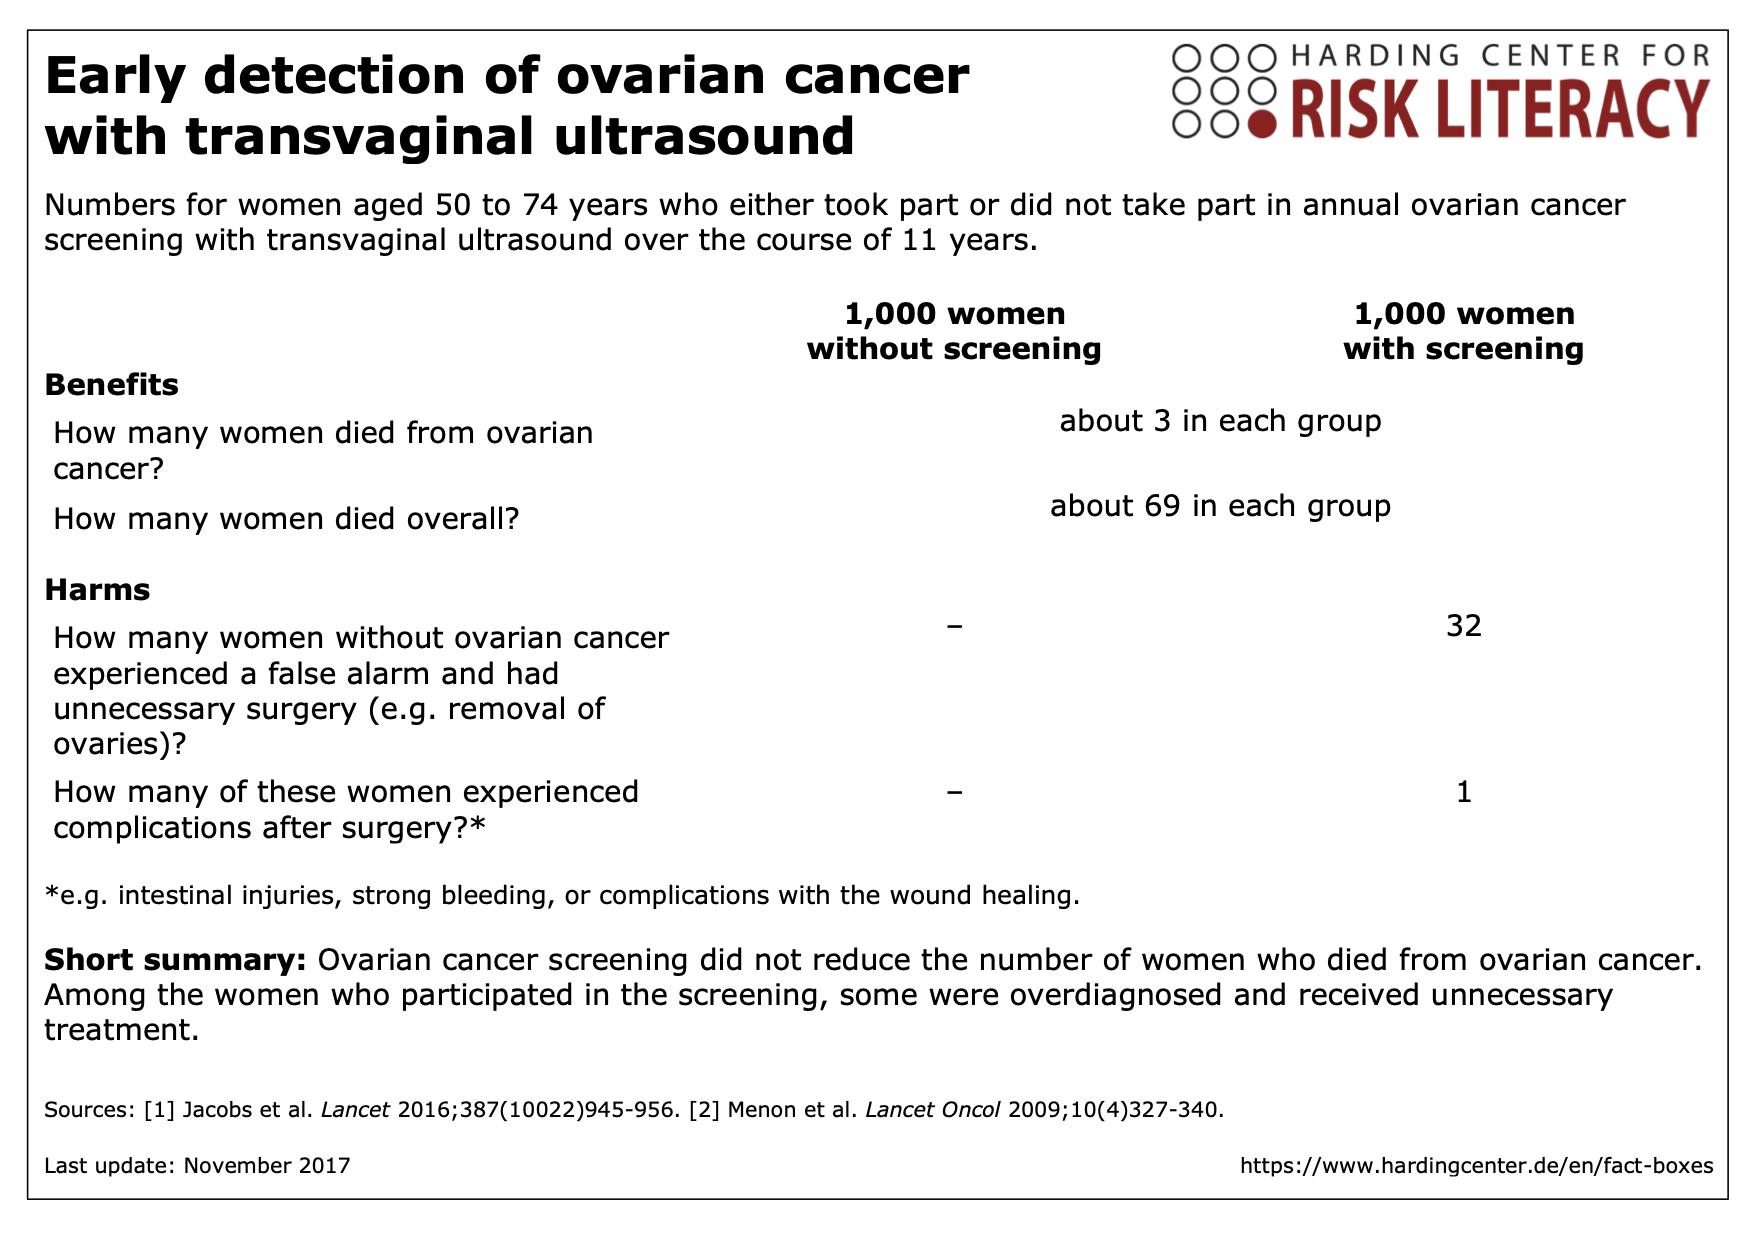 Early Detection Of Ovarian Cancer With Transvaginal Ultrasound Harding Zentrum Fur Risikokompetenz